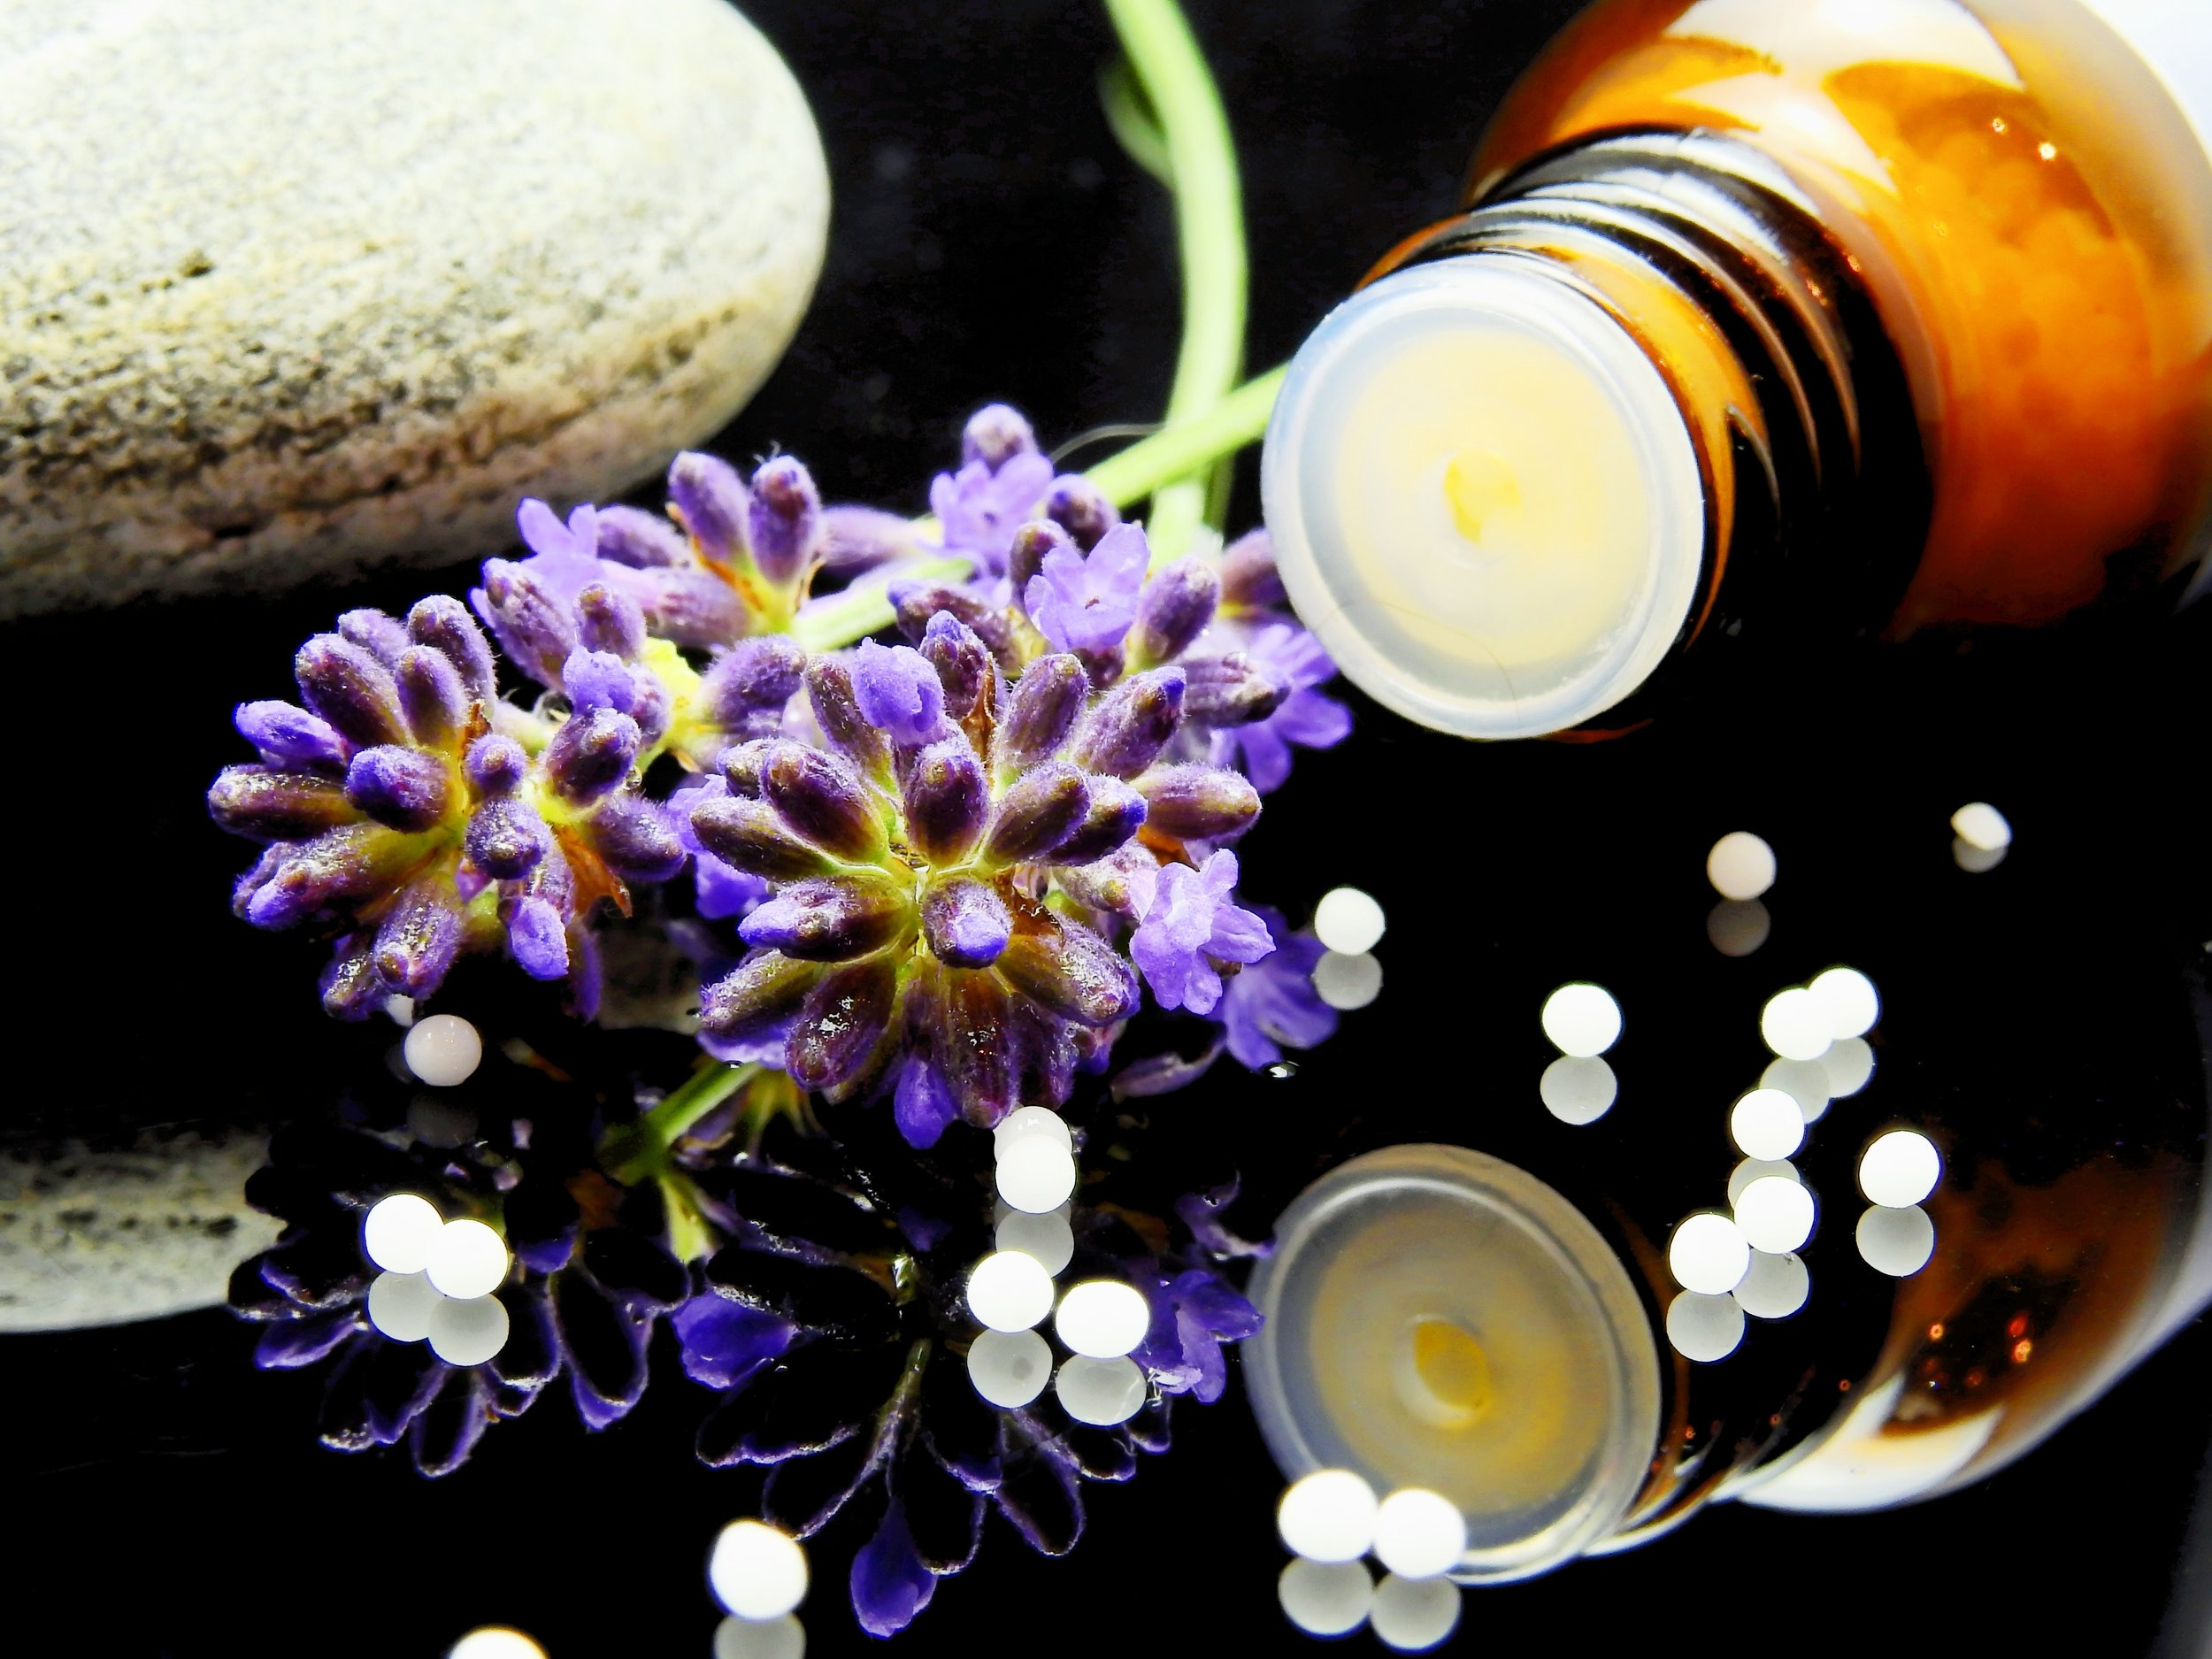 alternative-alternative-medicine-aromatherapy-163186.jpg